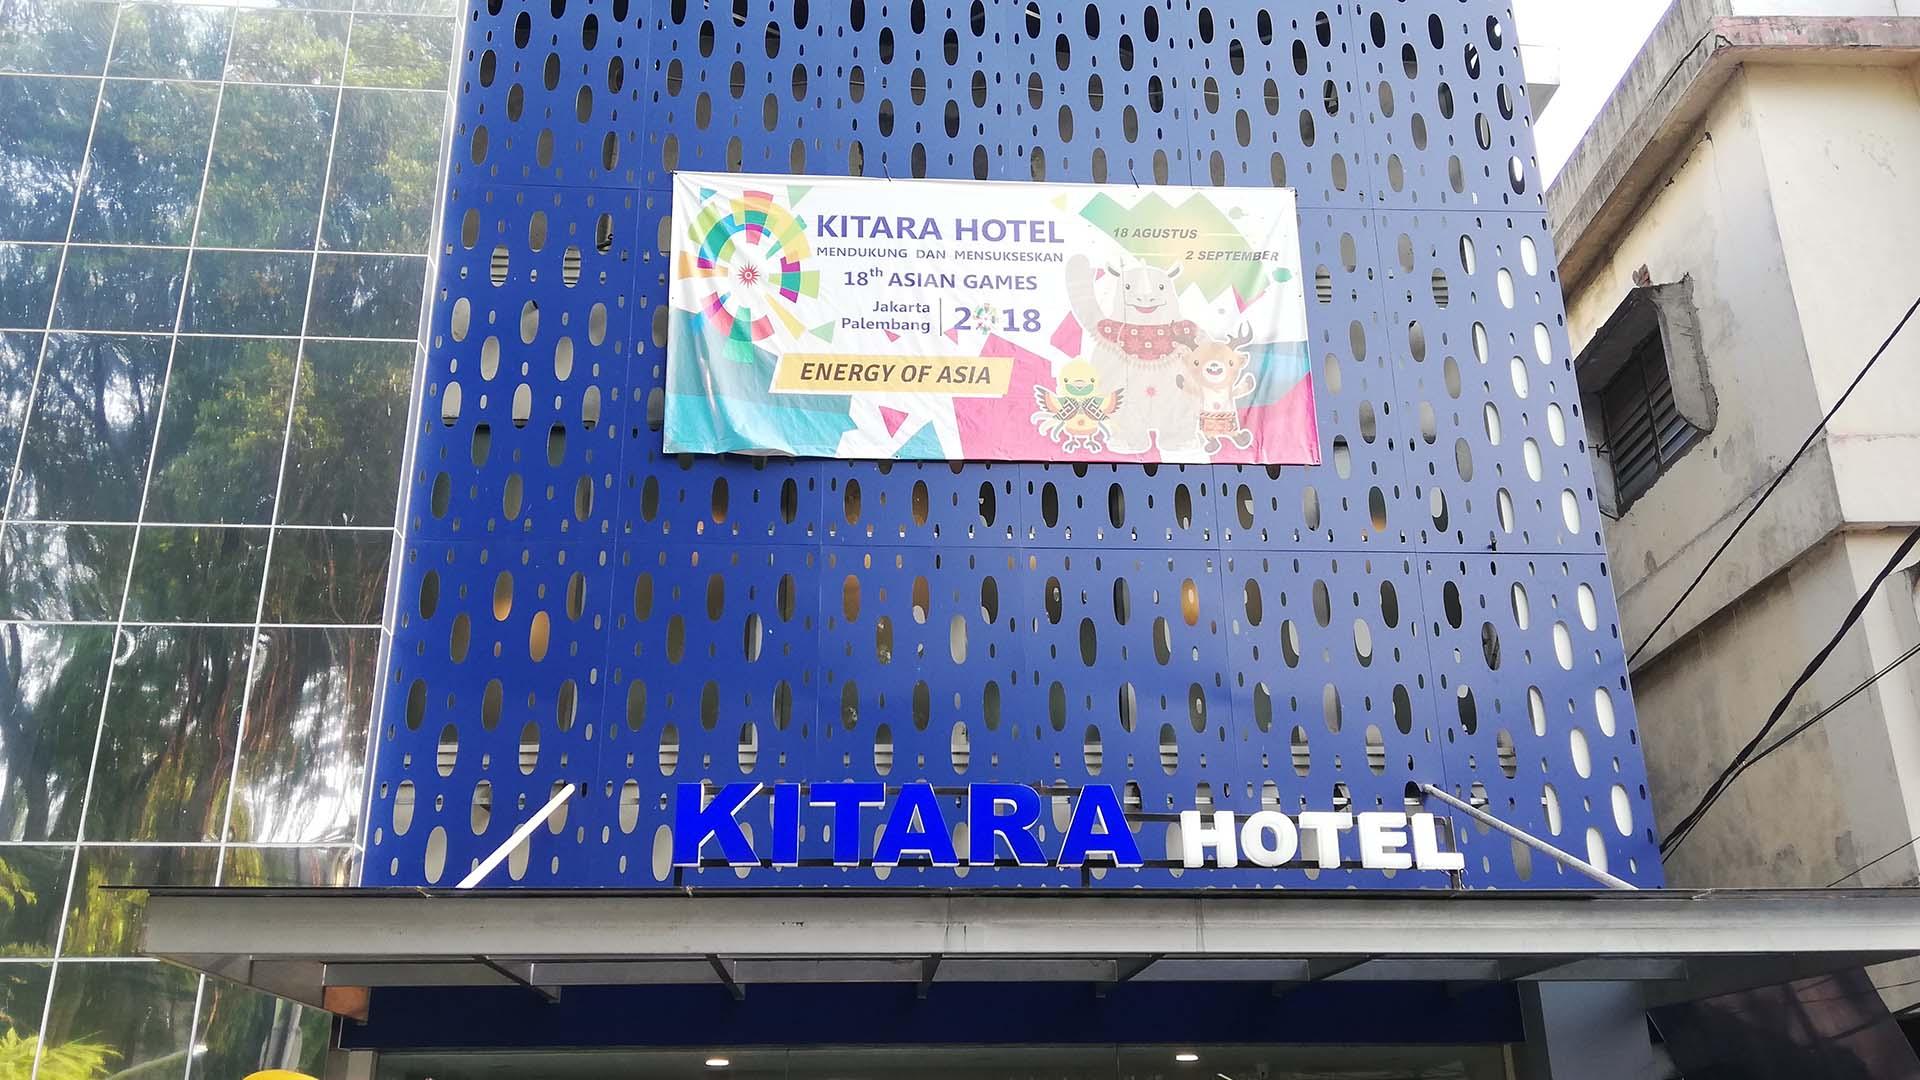 Kitara-Hotel, Jakarta